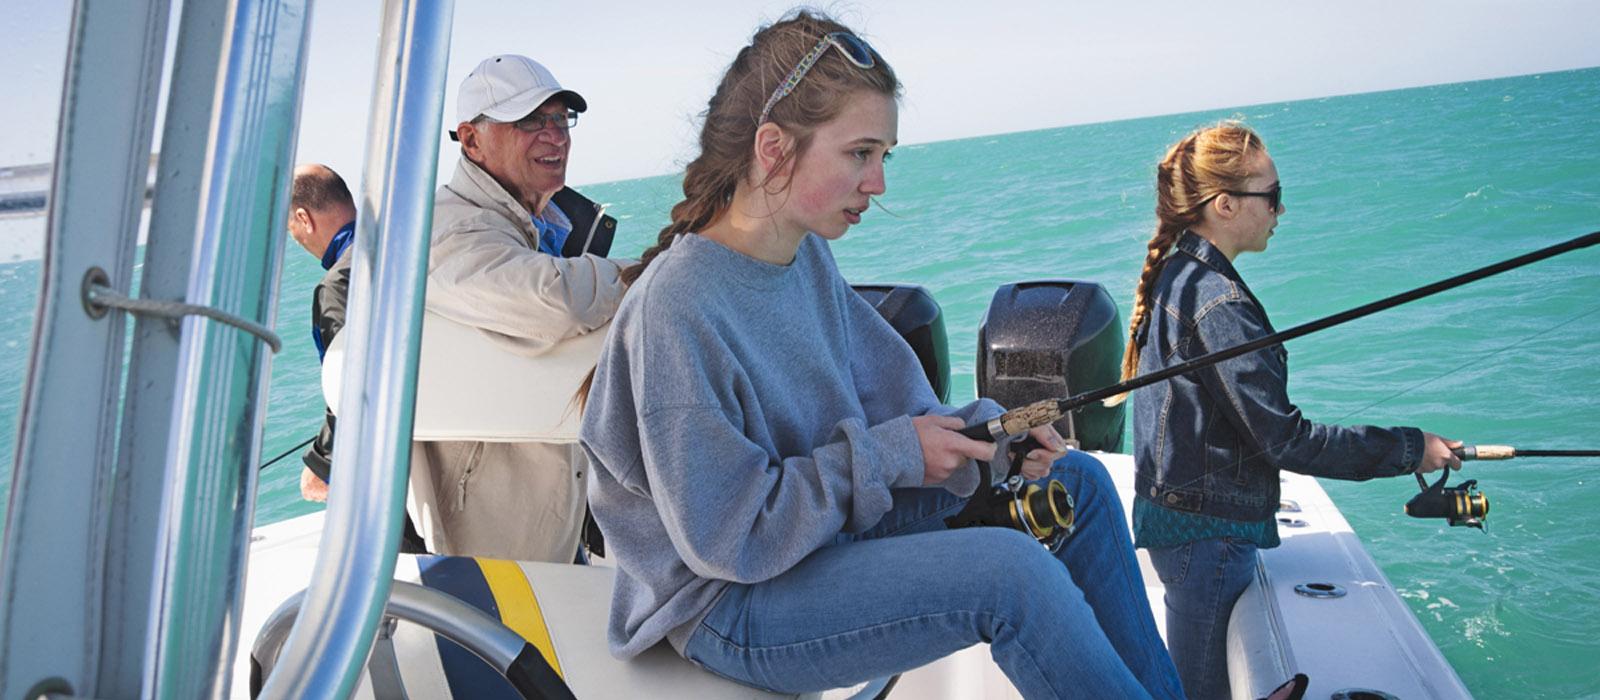 Cornerstone fishing trip